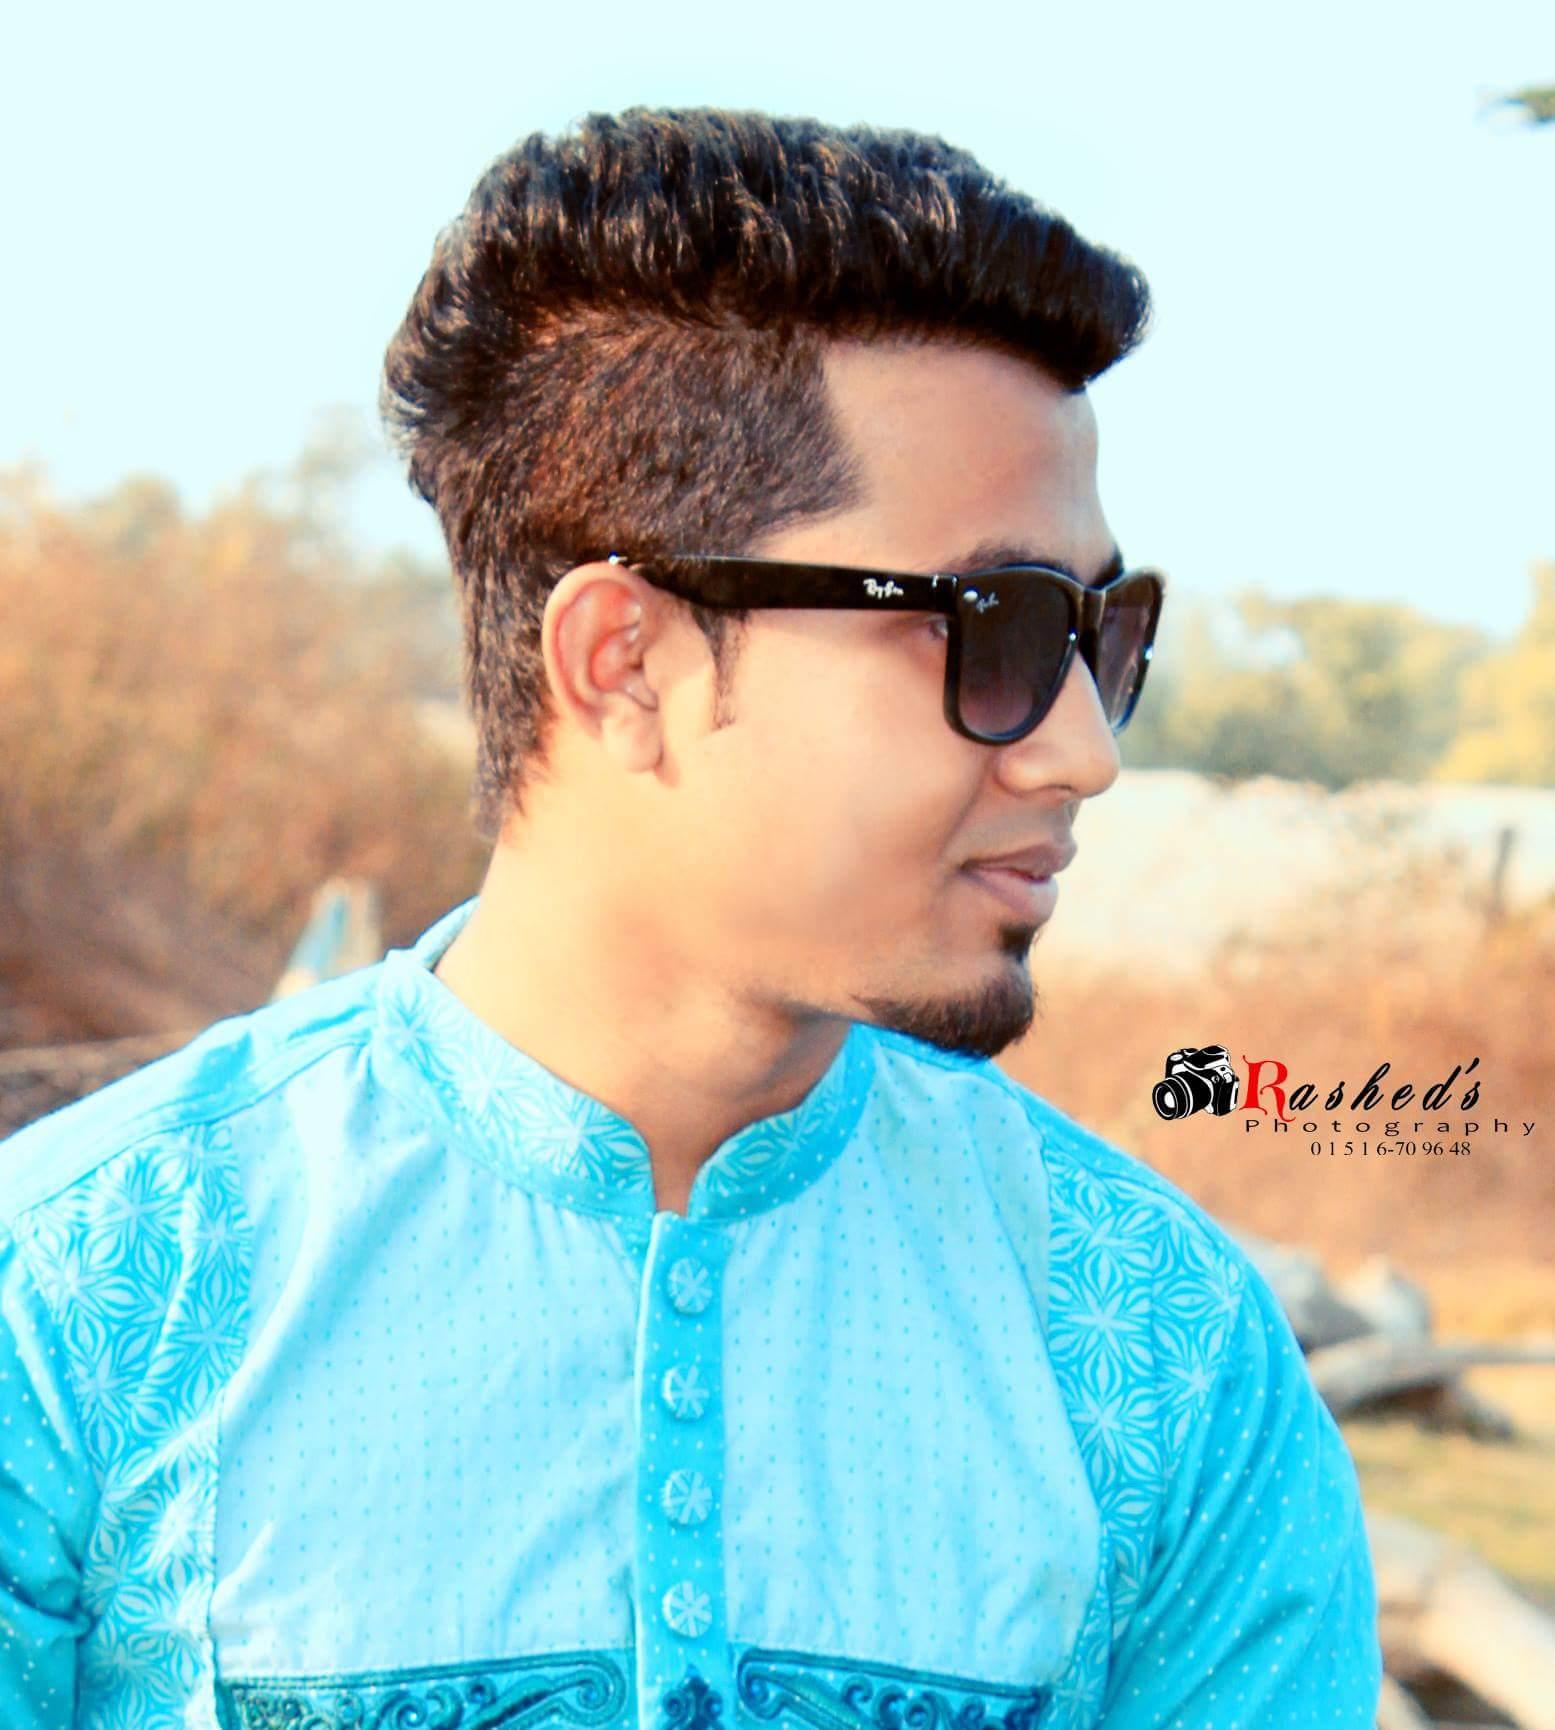 Rashed Parvez